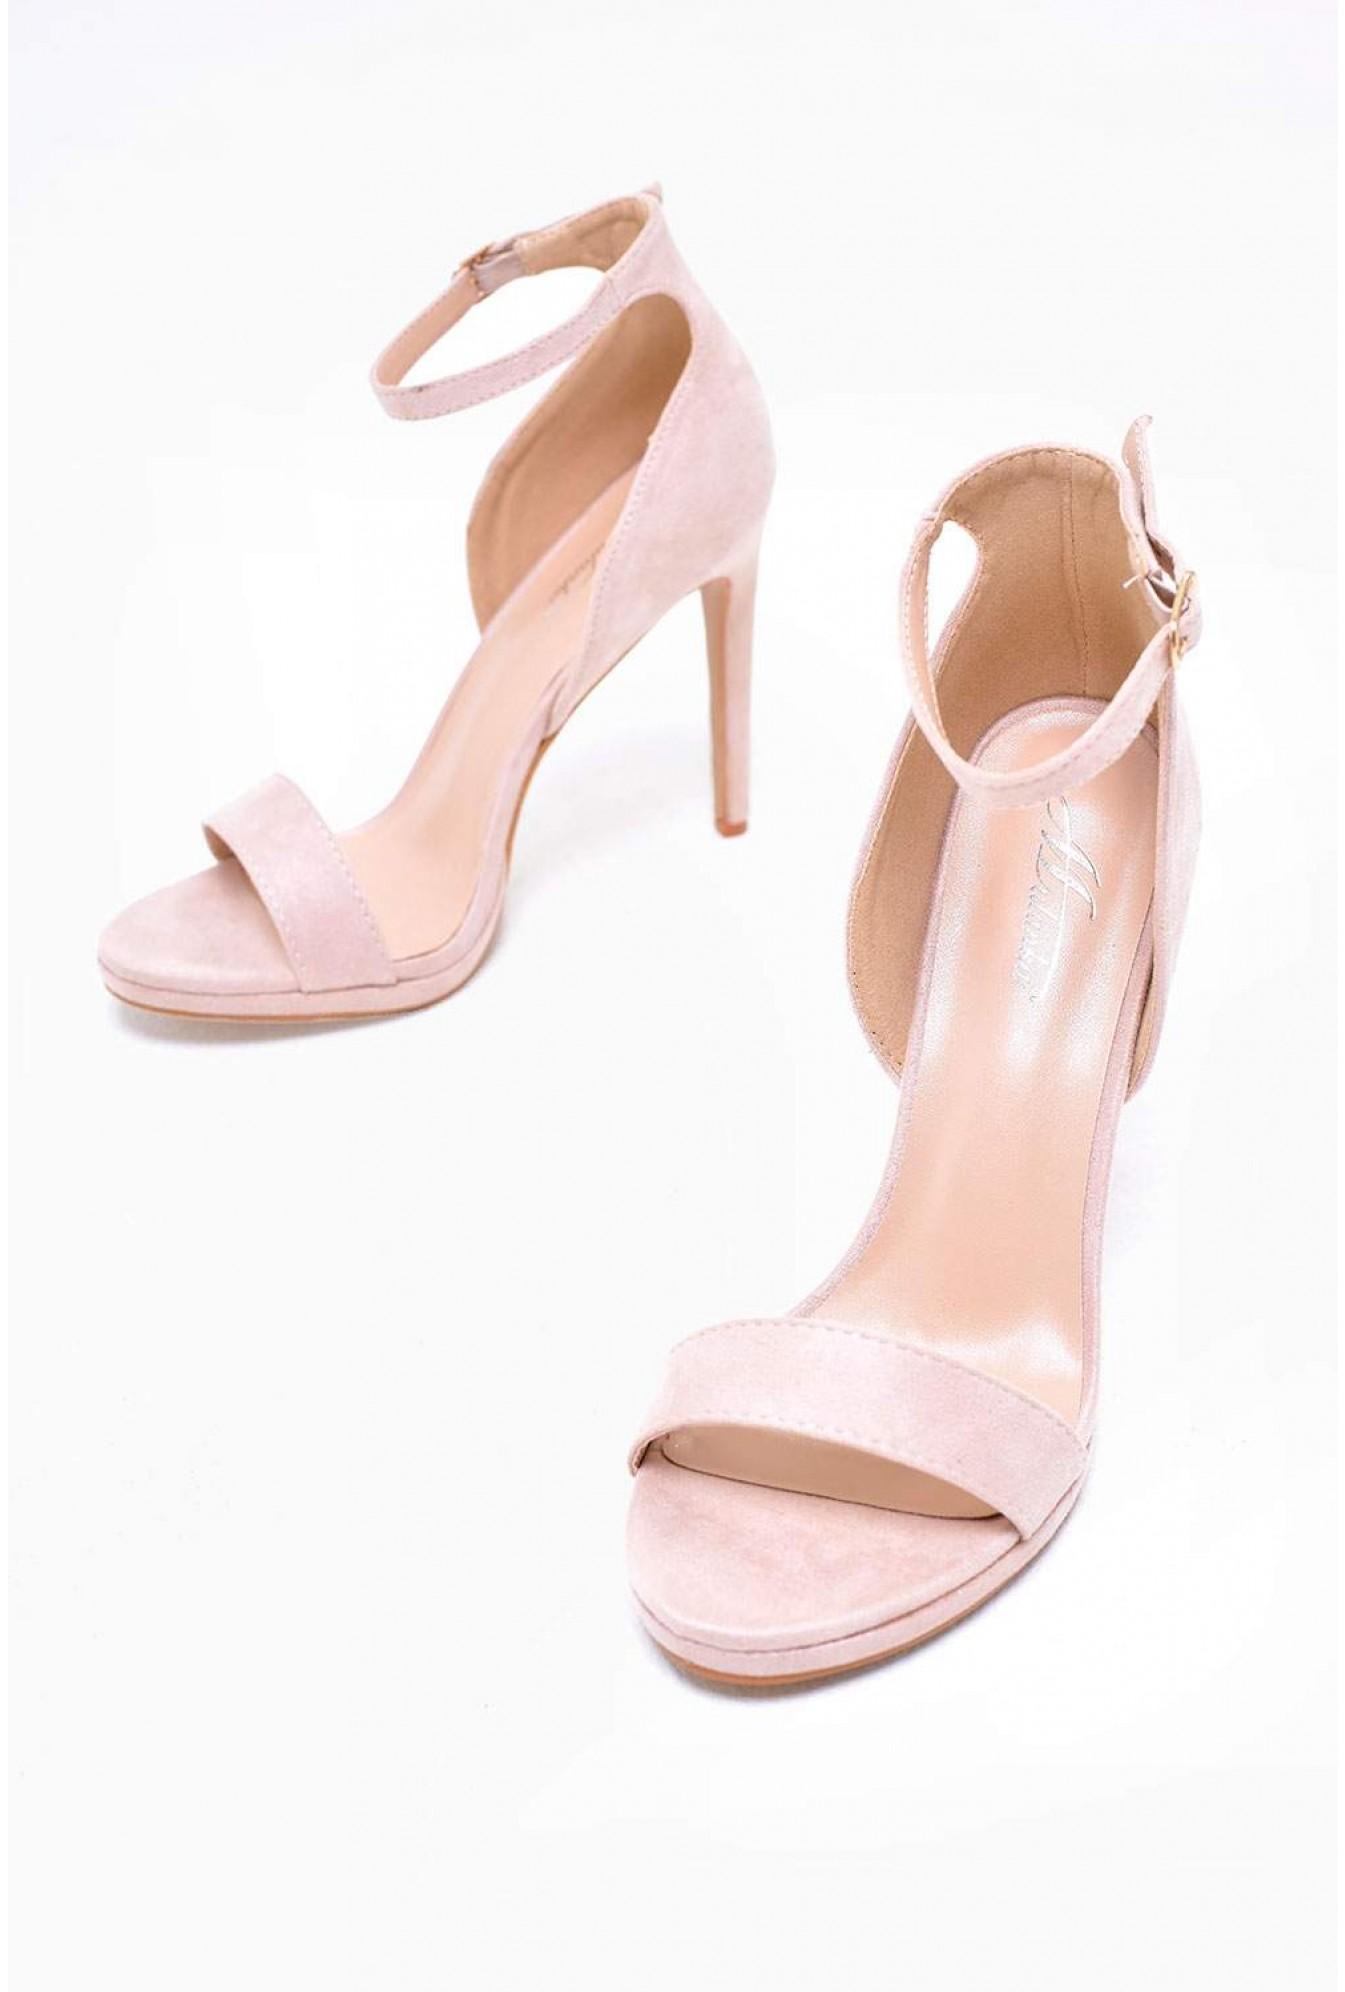 75034ff2ee1 No Doubt Nelly Ankle Strap Platform Sandals in Beige